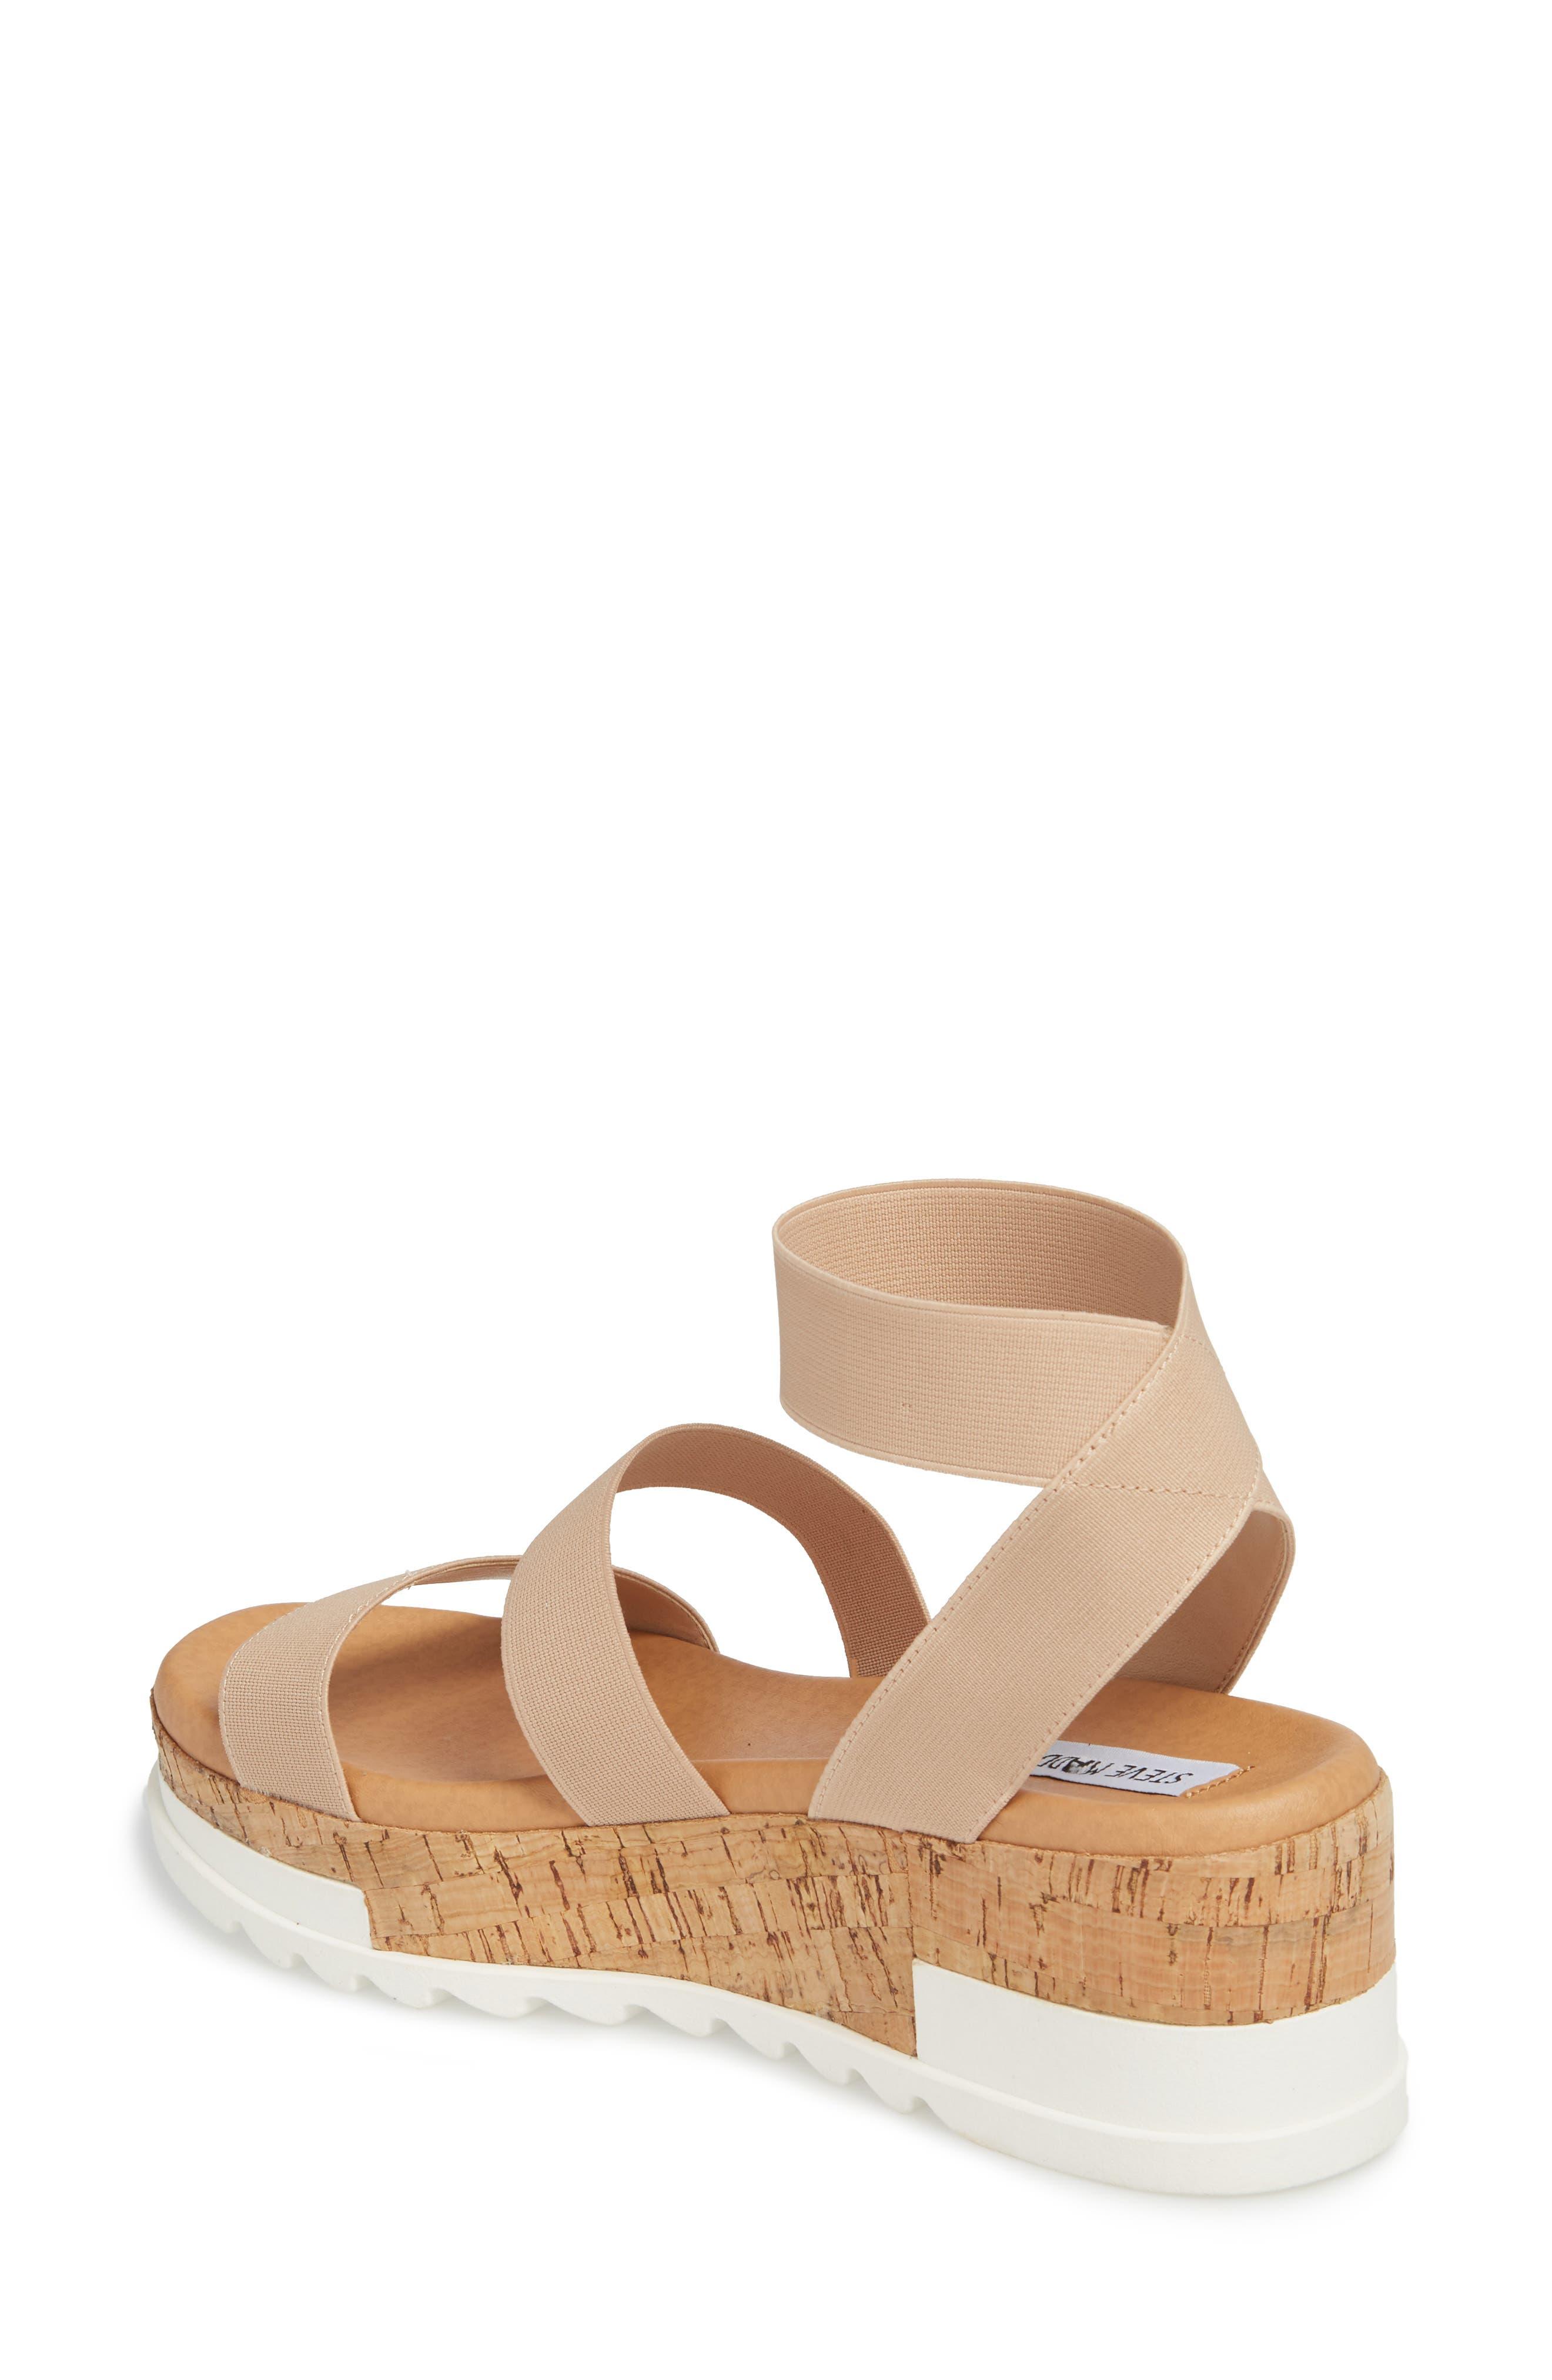 Bandi Platform Wedge Sandal,                             Alternate thumbnail 2, color,                             BLUSH